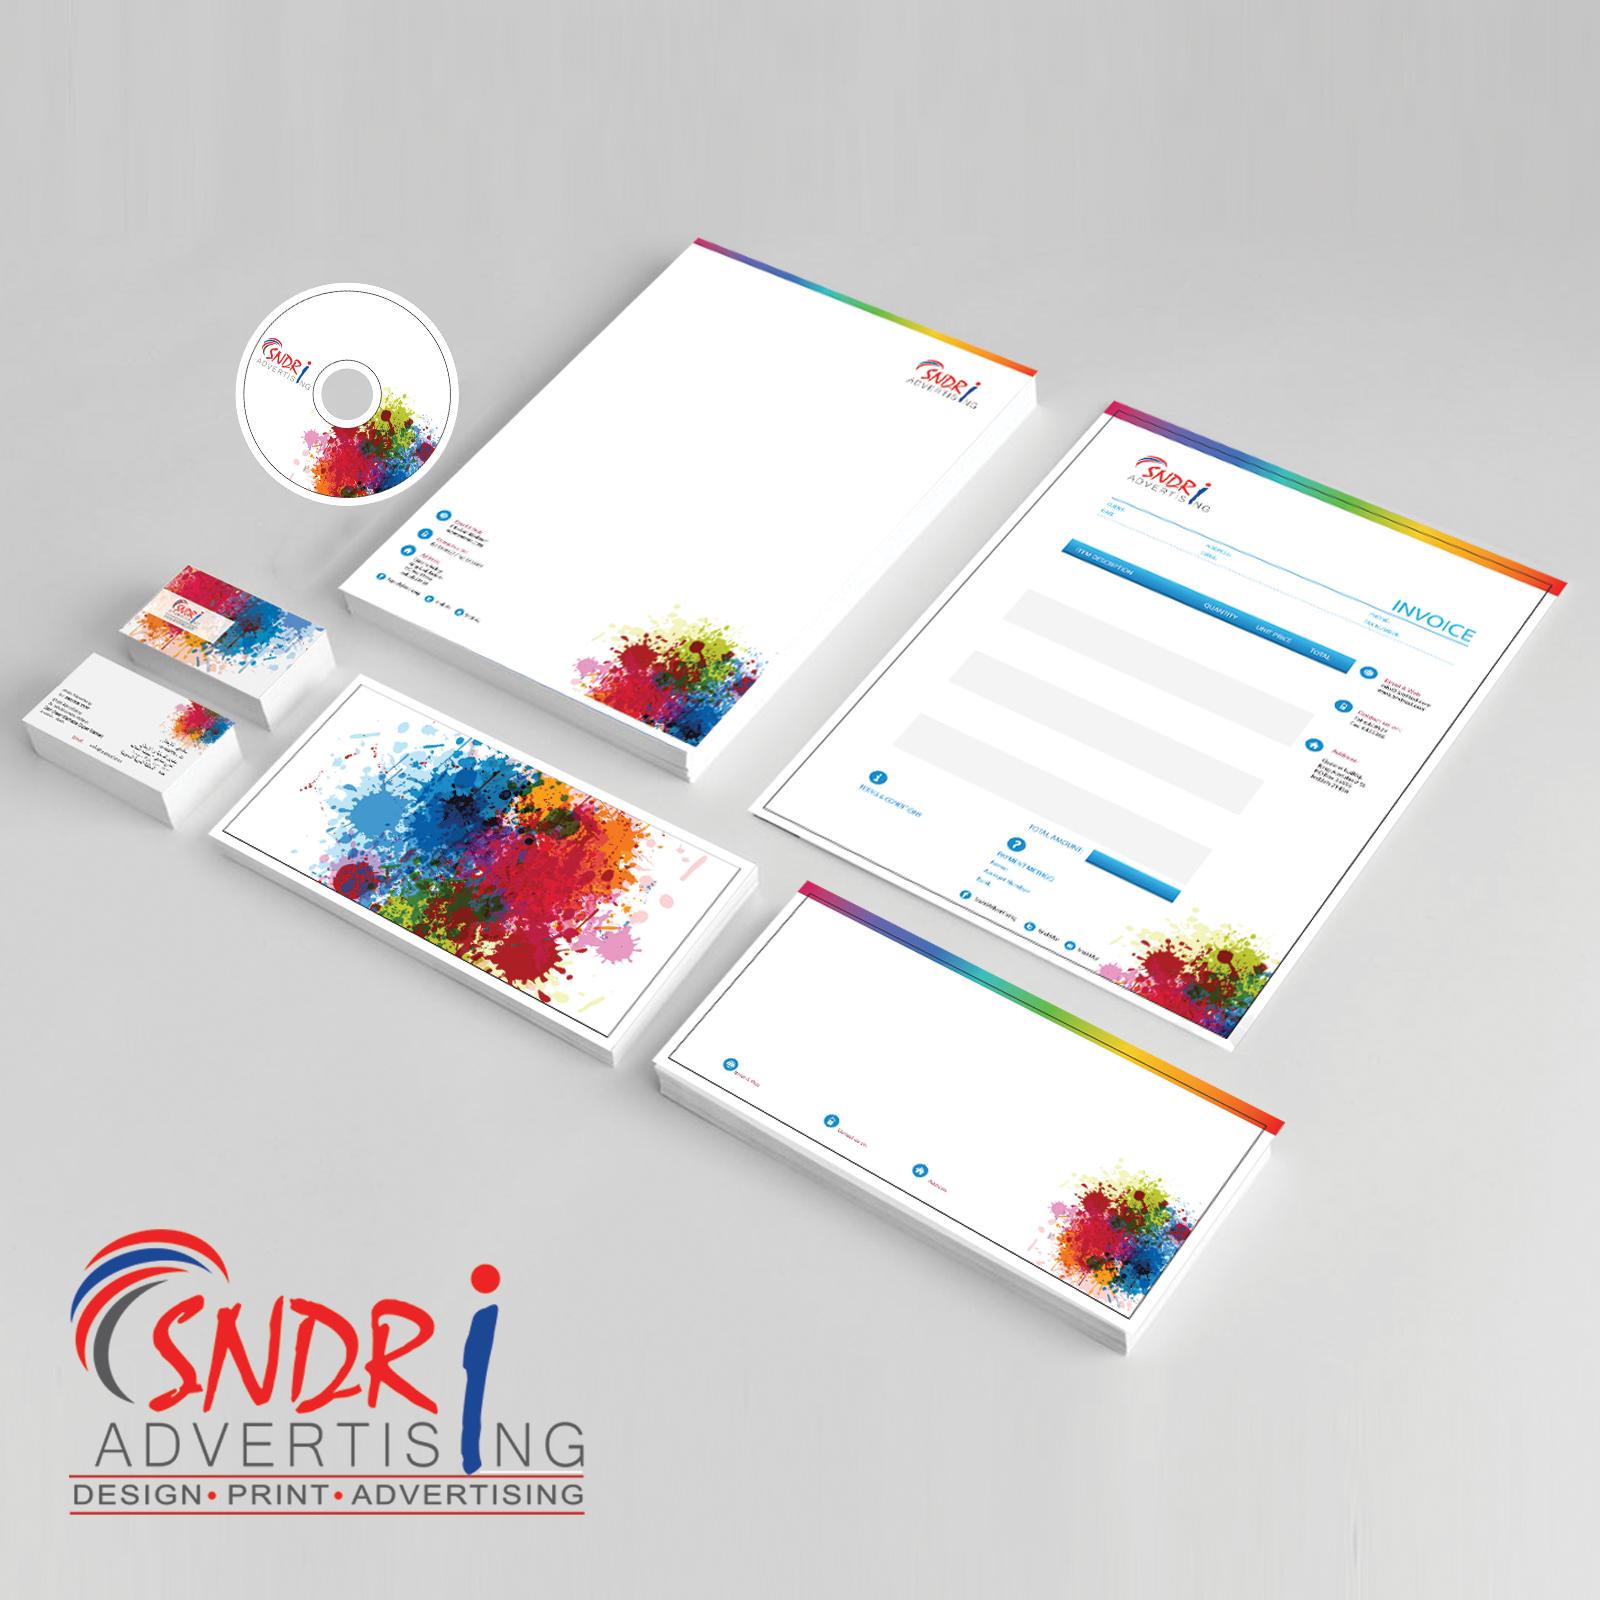 Advertising Agencies Jeddah Saudi Arabia Meet The Best Advertising Agency In Jeddah Who Provide Best Quality Print Advertising Advertising Agency Print Design